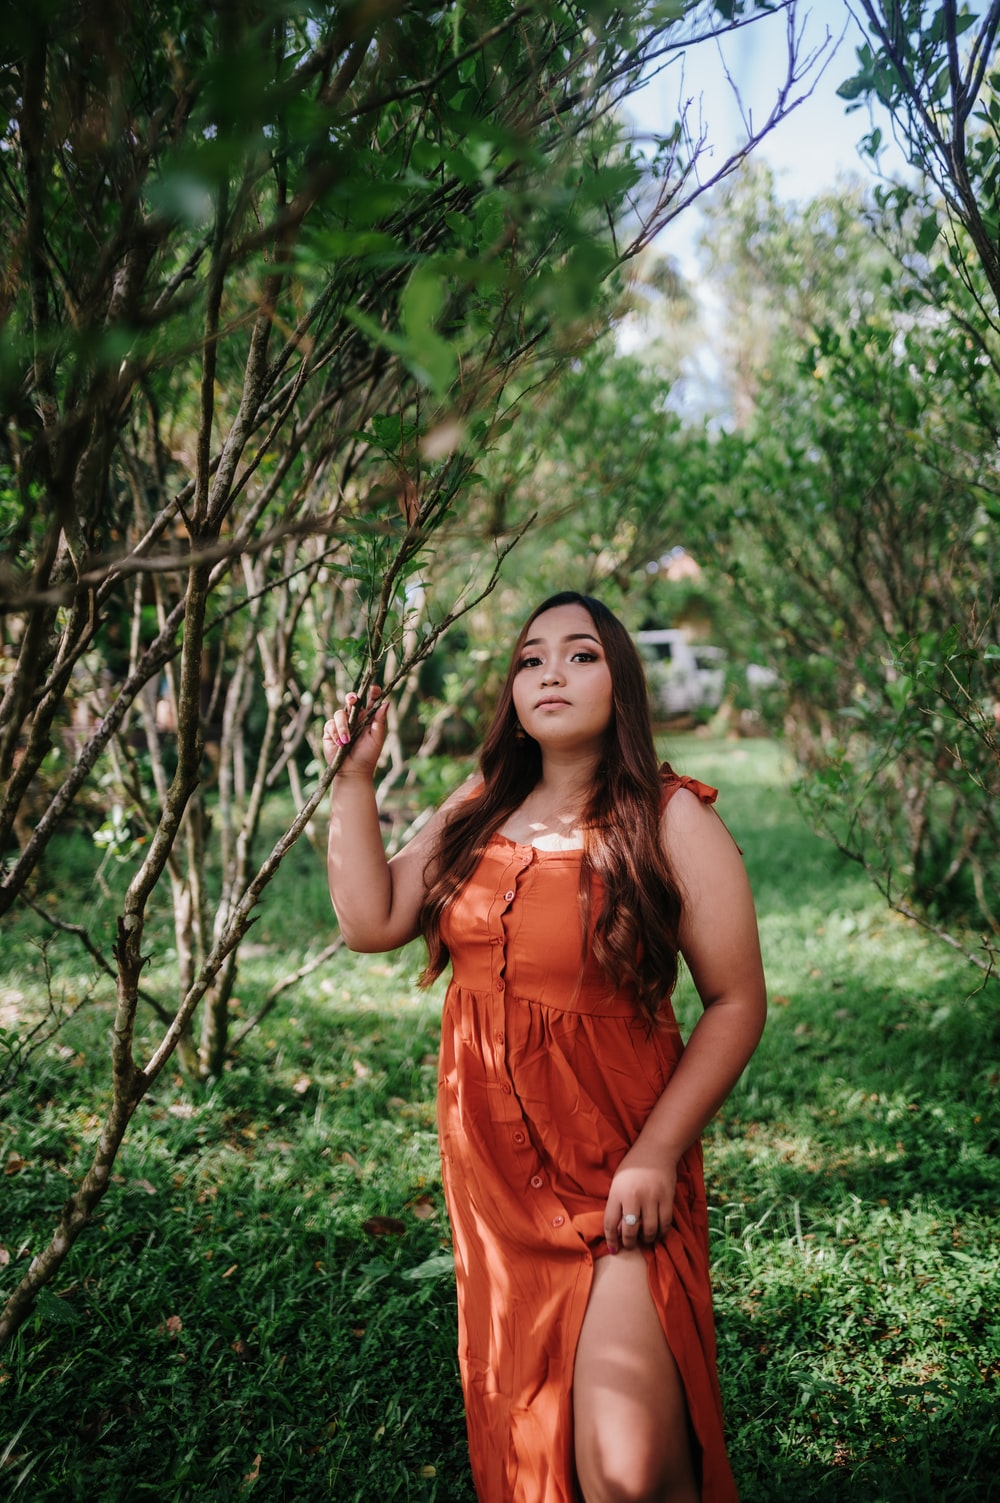 woman in orange sleeveless dress standing on green grass field during daytime